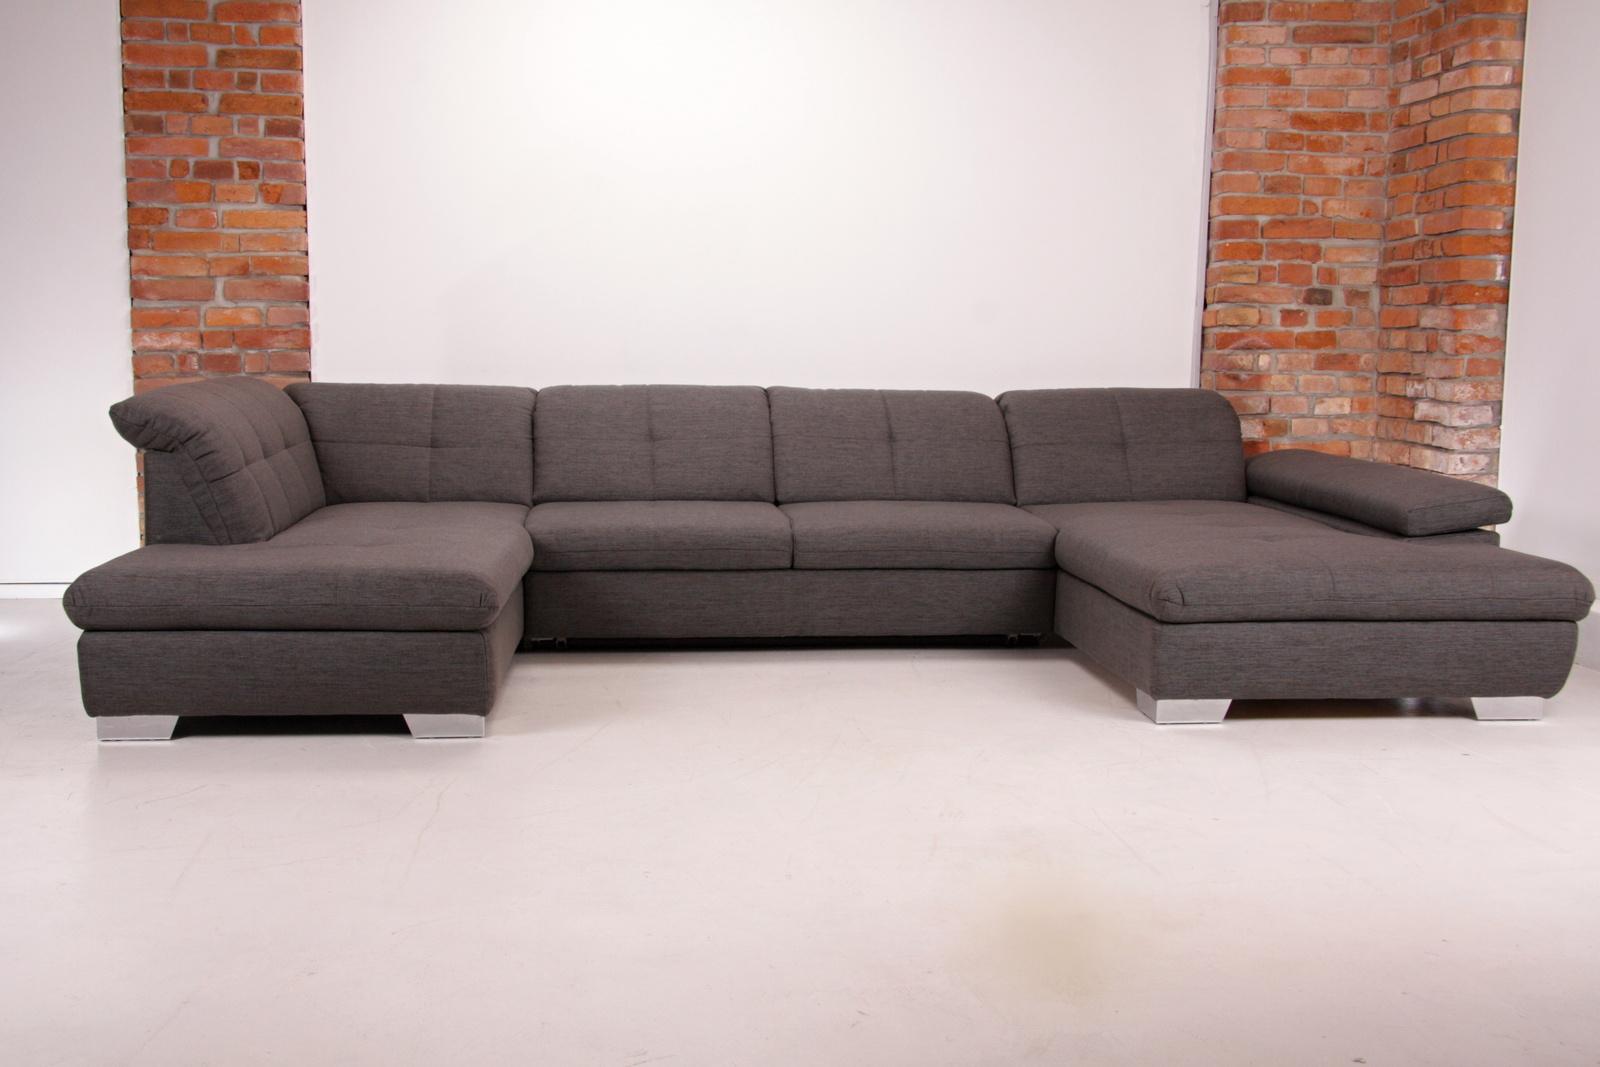 Xora sofa fabulous xora in alufarben anthrazit textil for Schlafsofa xora